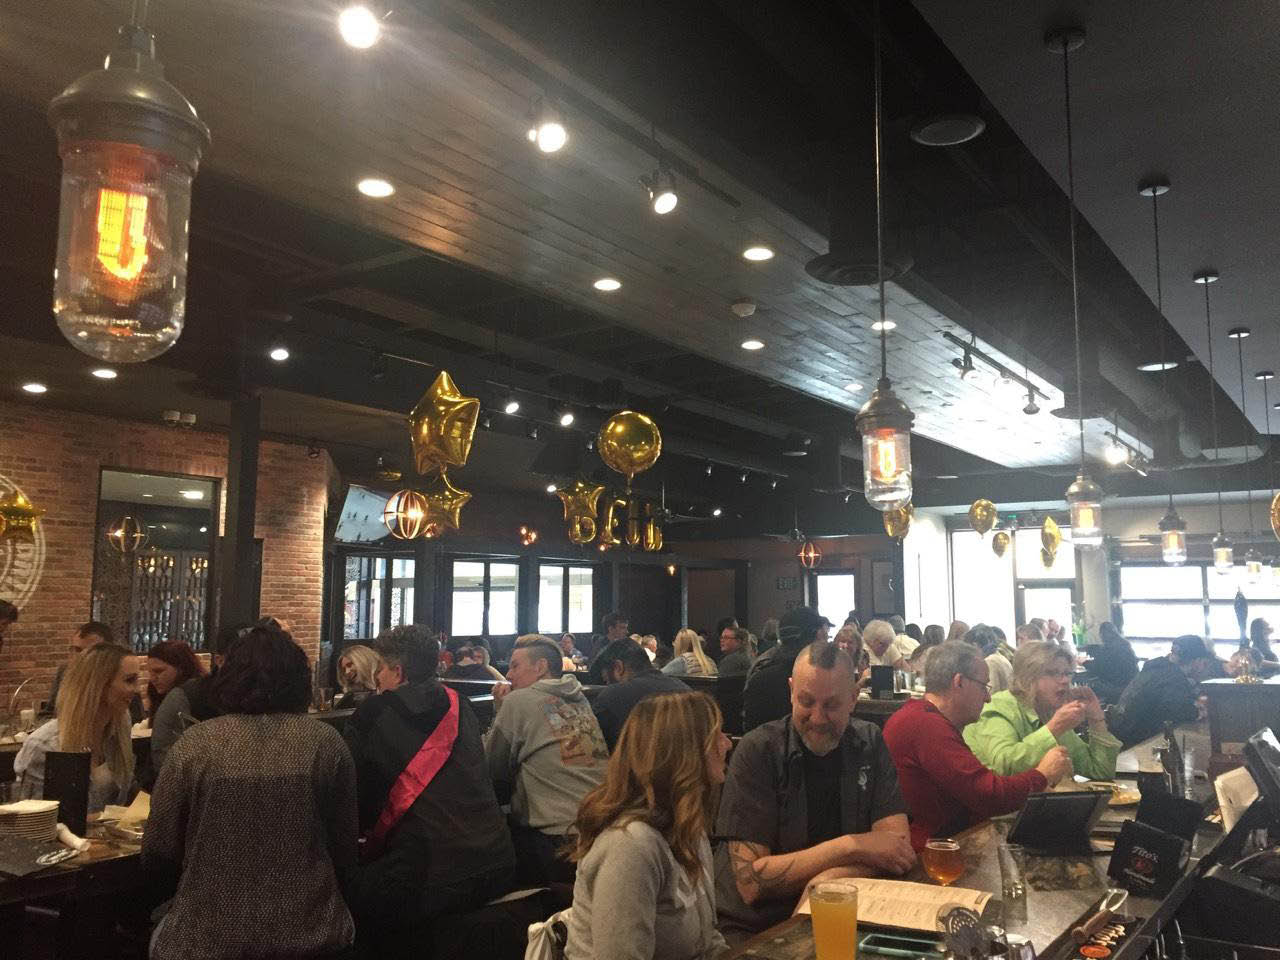 crowd enjoying World of Beer beers, drinks, and food in Washington.